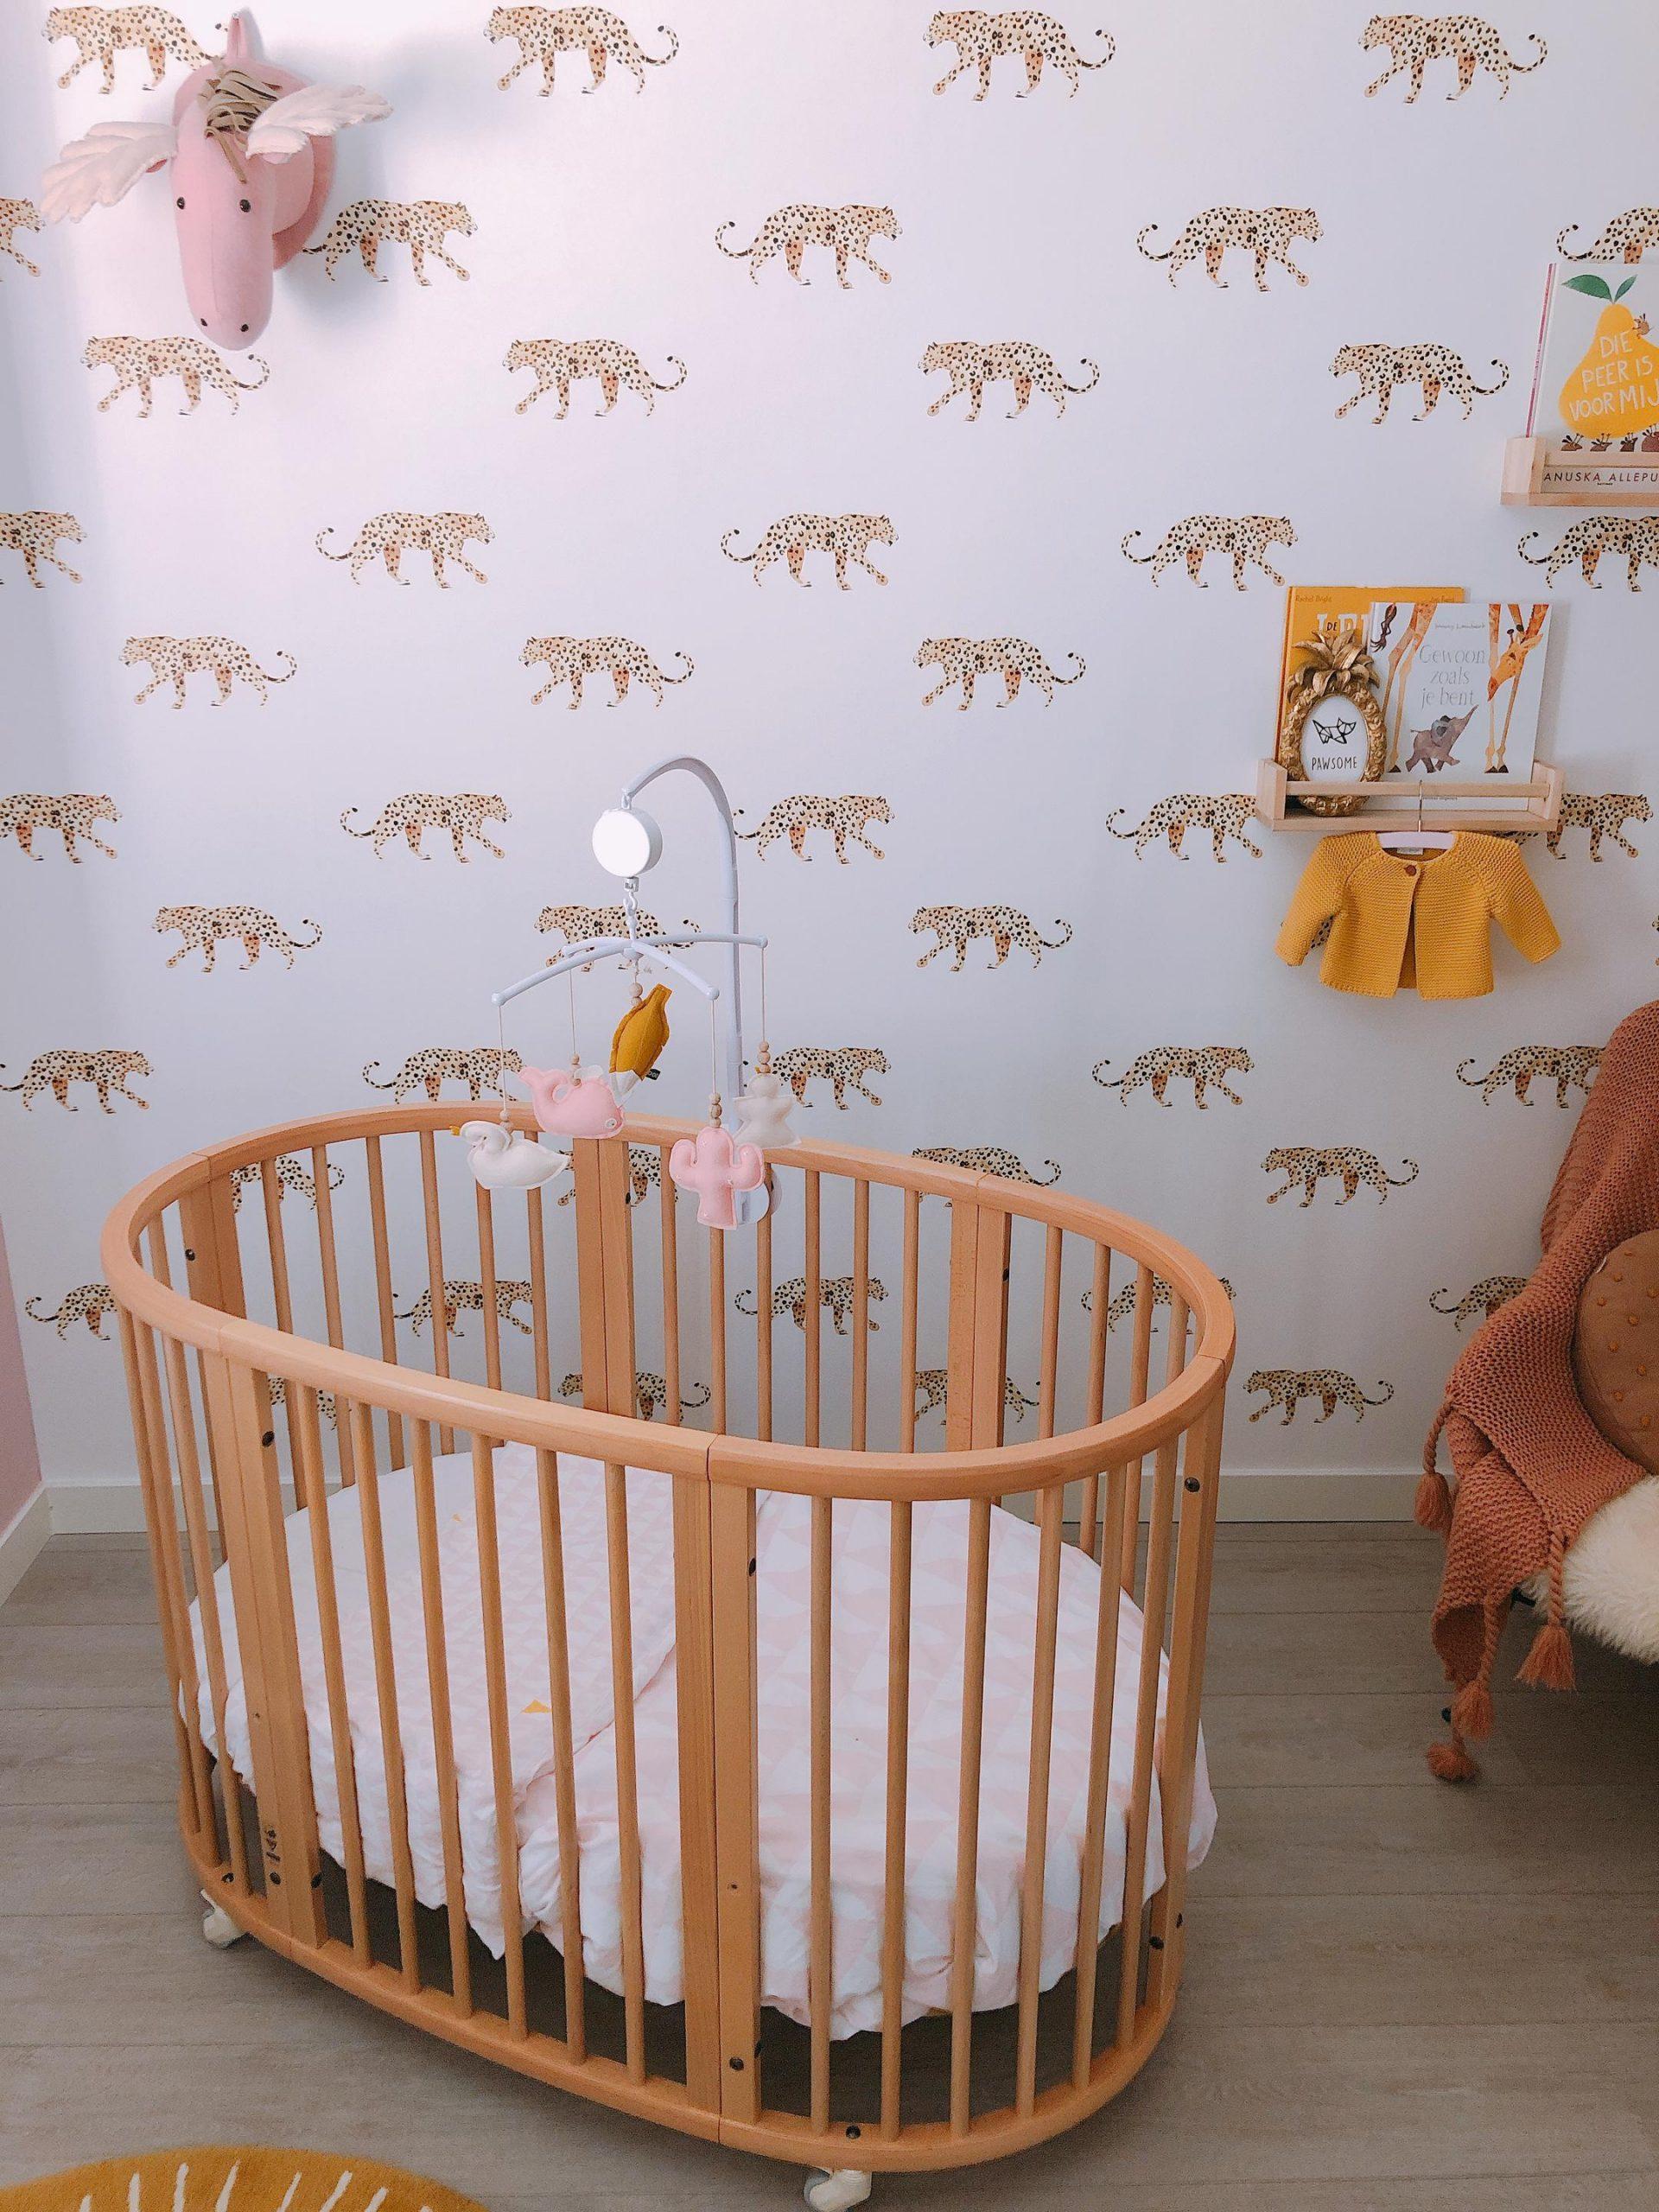 IMG 6971 2160x2880 1 scaled - De baby/kinderkamer van Hazel - roze, hout & marmer!